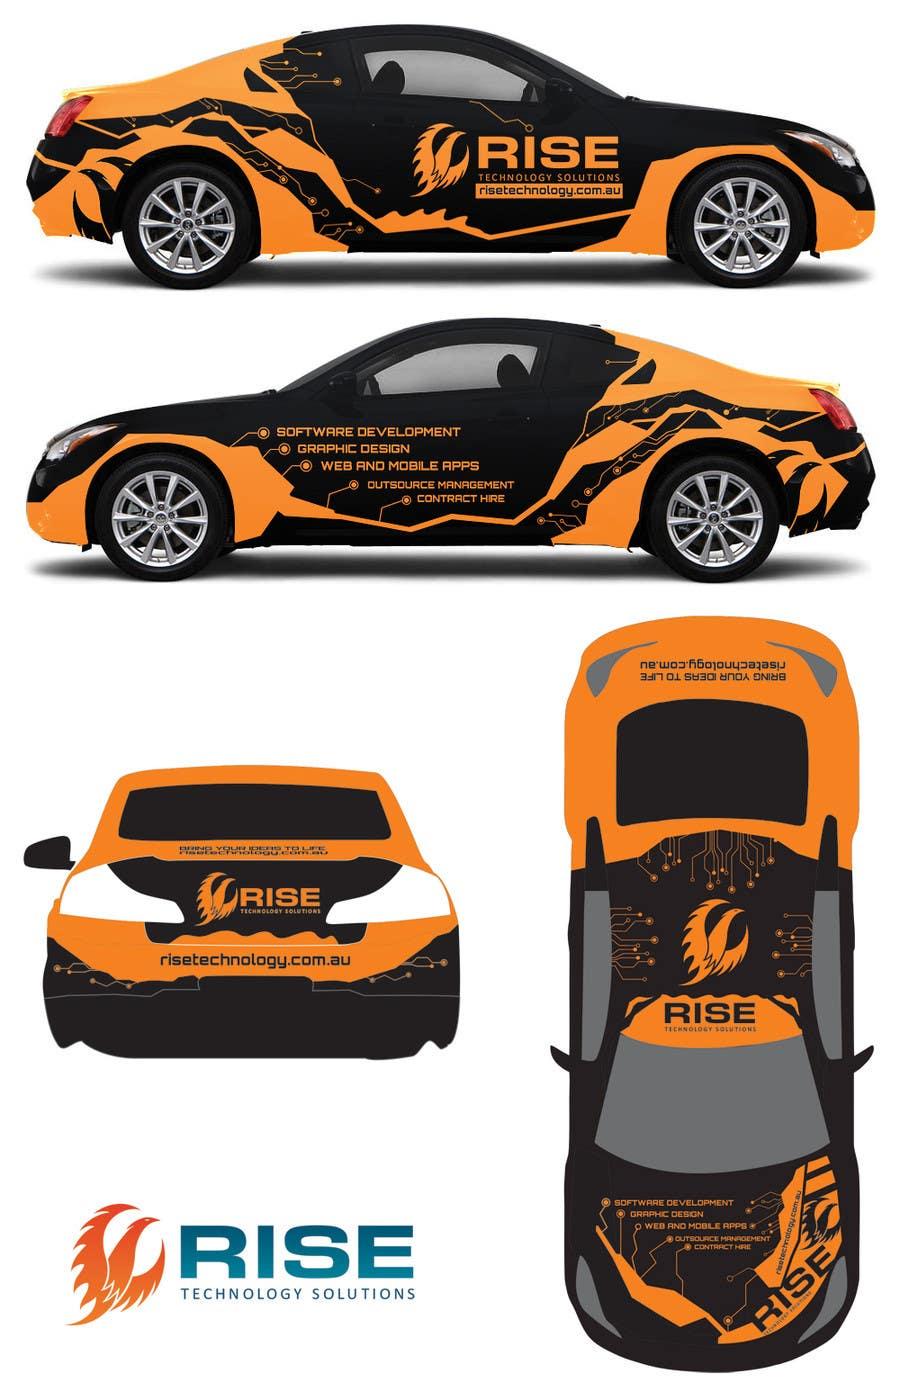 Bài tham dự cuộc thi #                                        38                                      cho                                         Car Wrap Design for RISE Technology Solutions